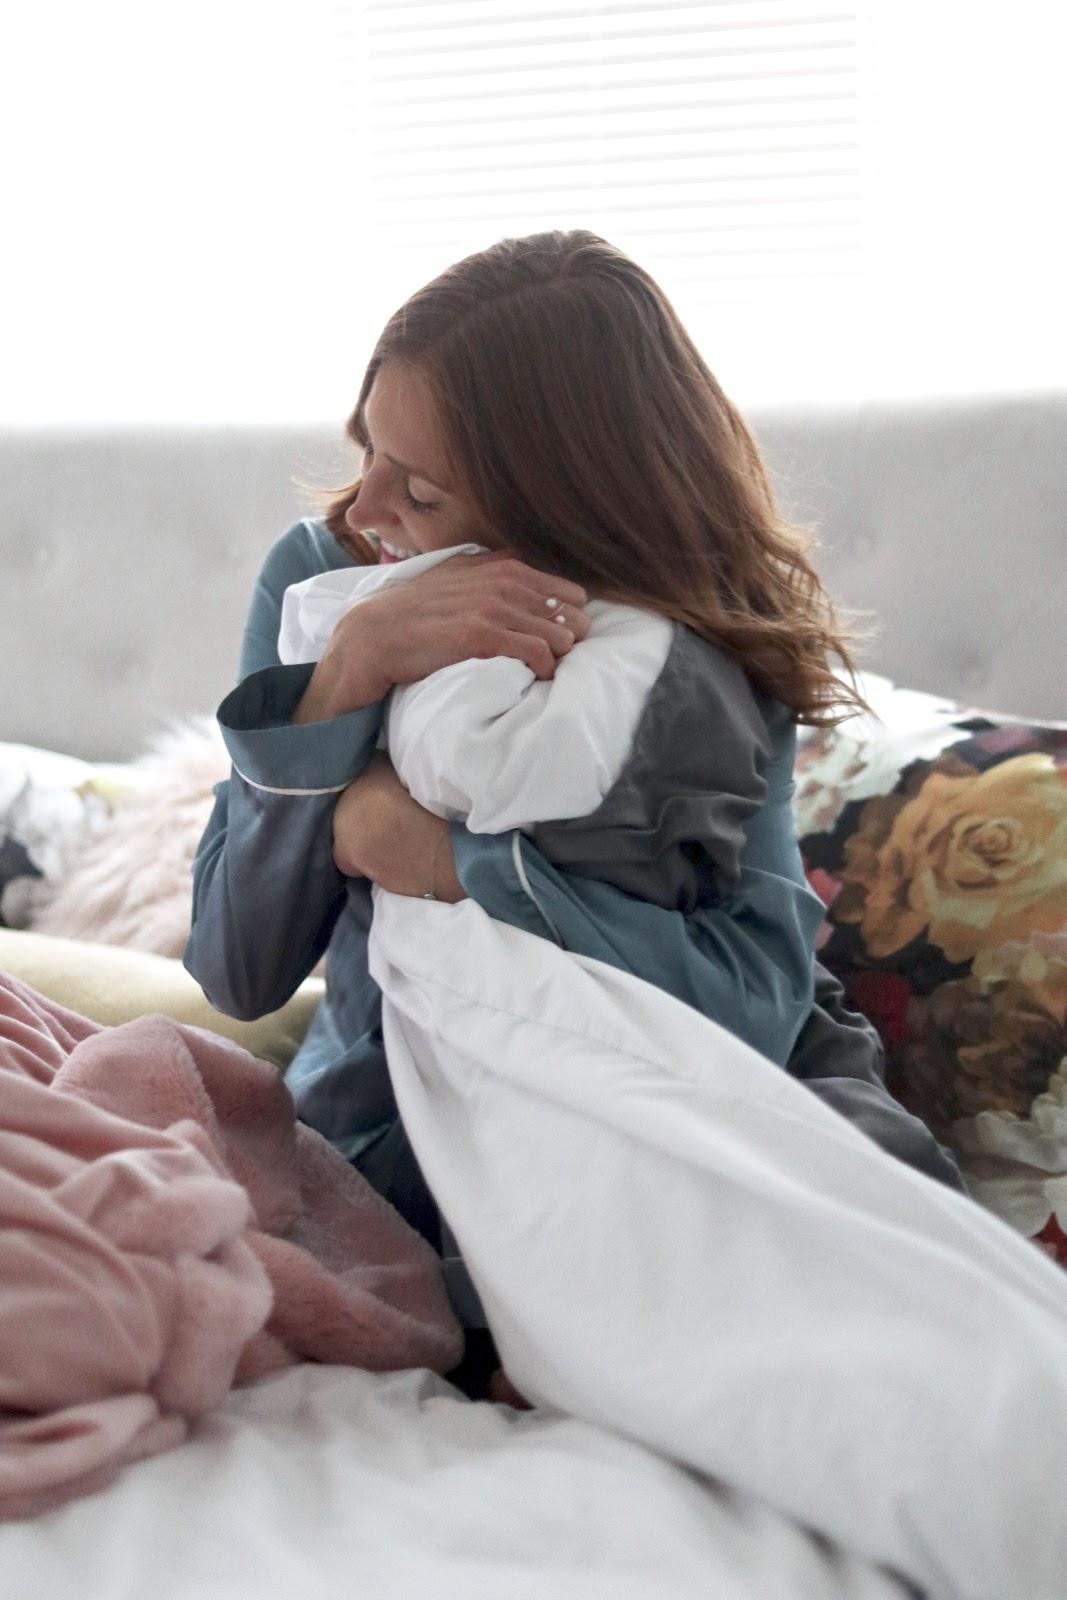 The softest bedding from Benji Sleep